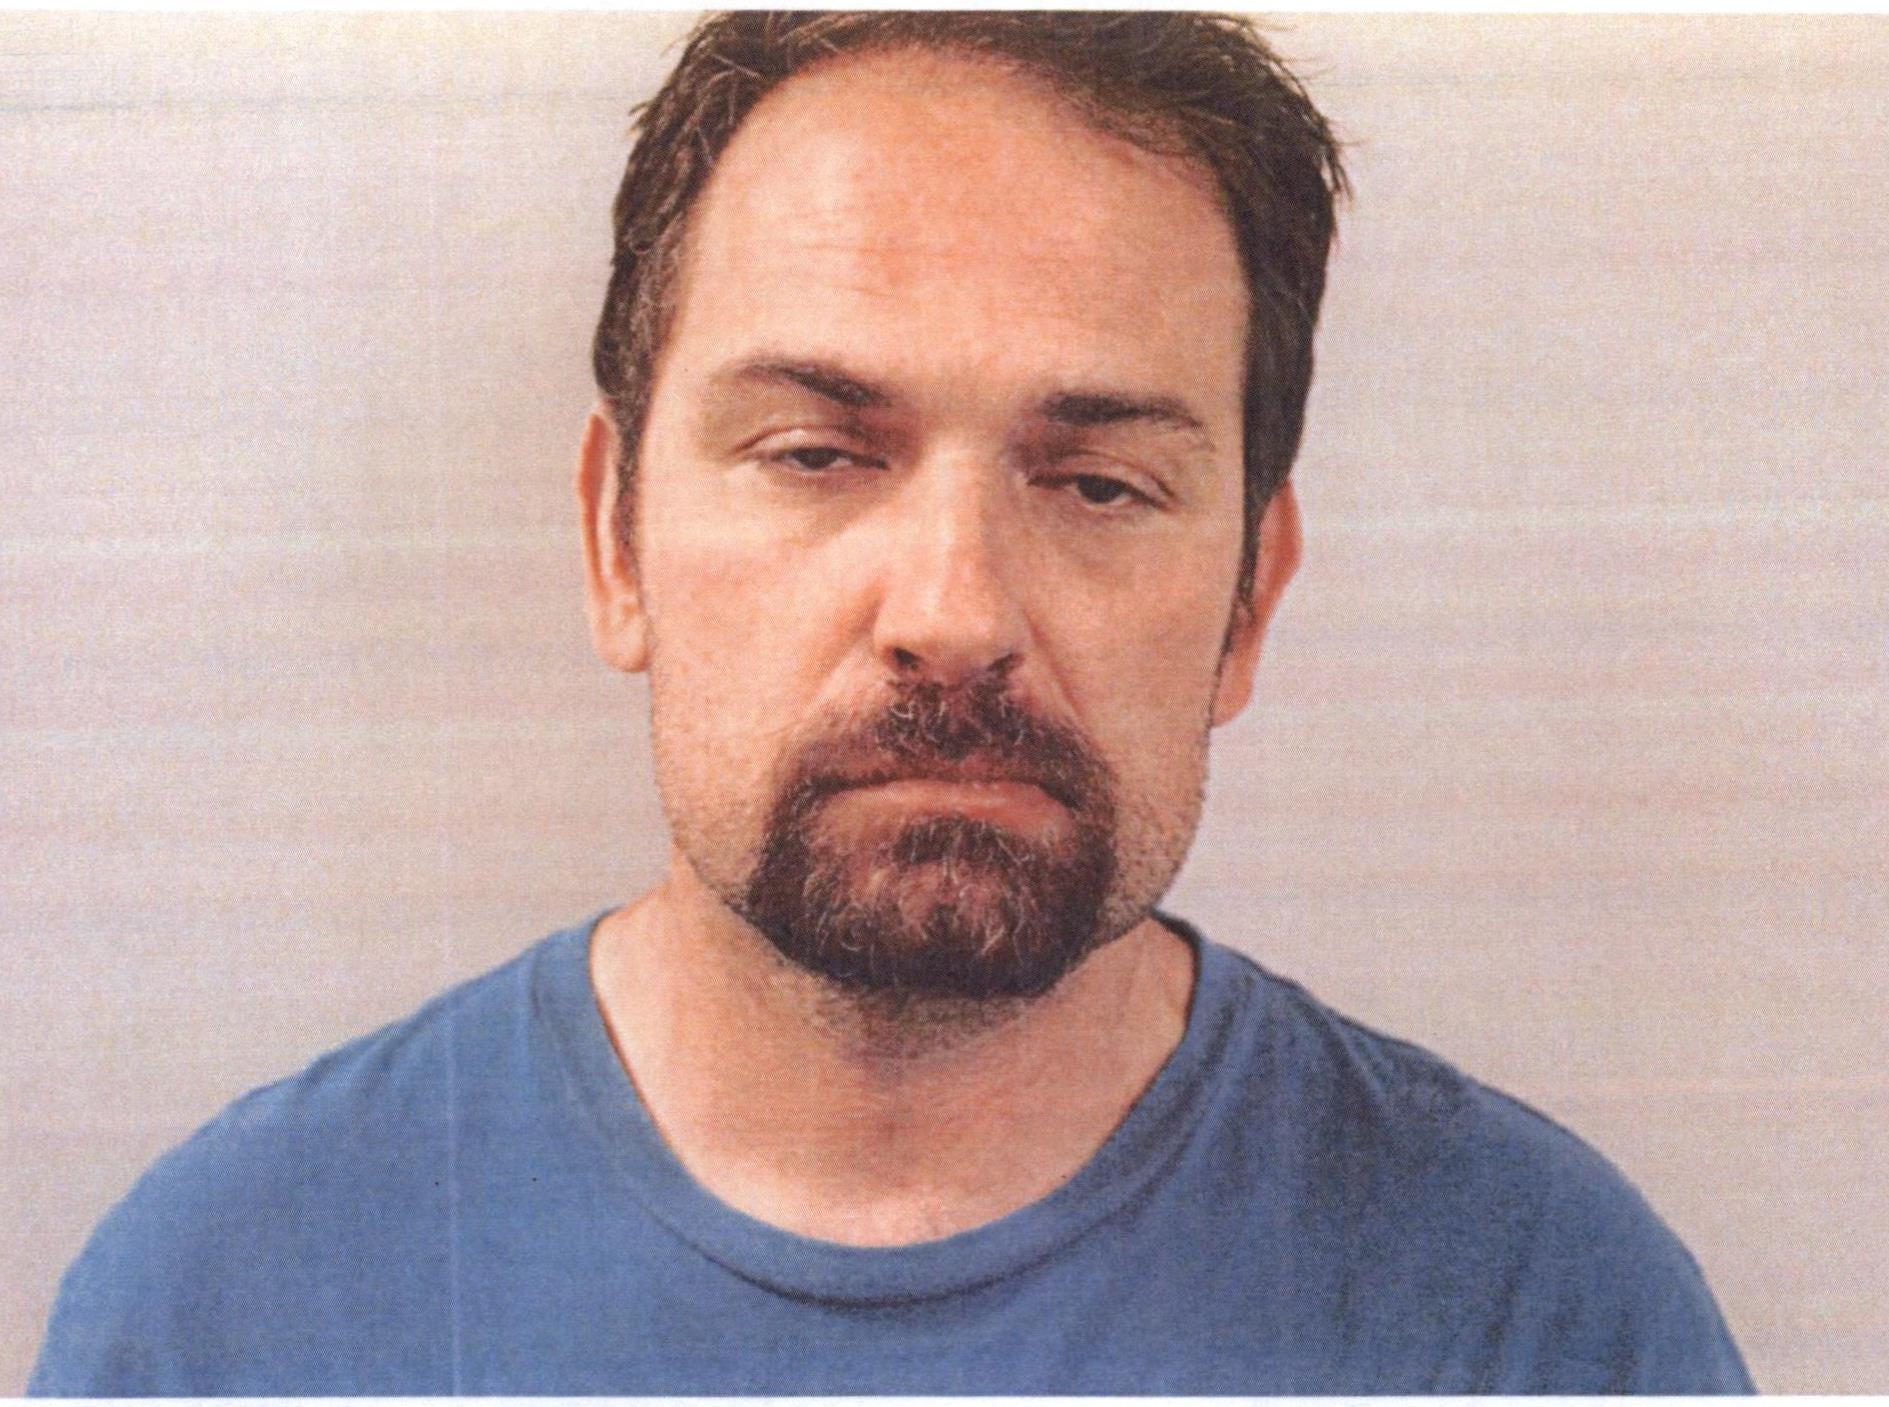 Gabriel Eppley convicted in Ruidoso home invasion